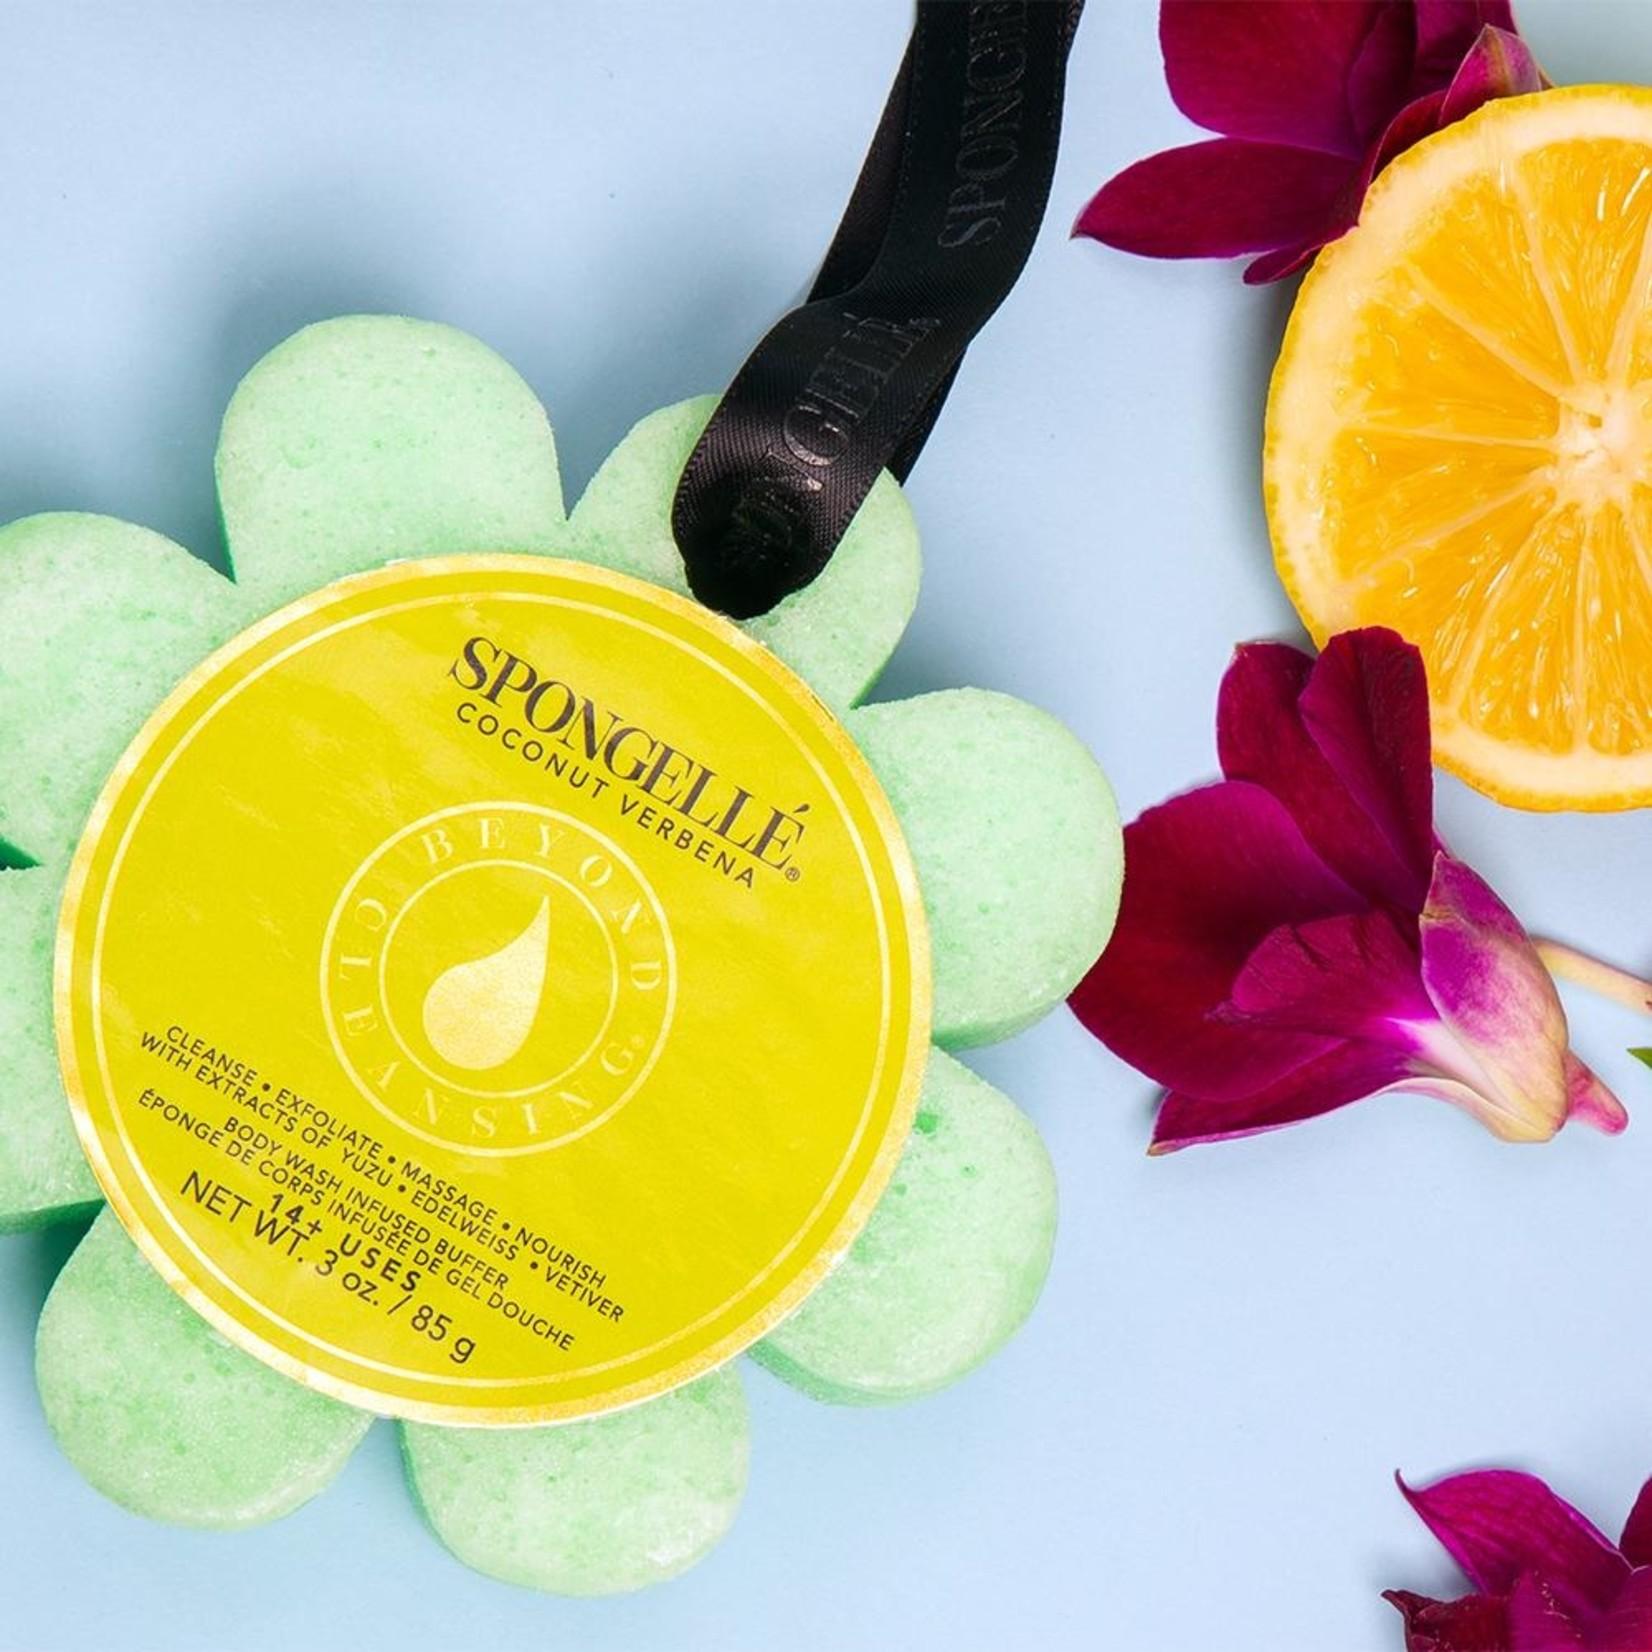 Spongelle Coconut Verbena   Wild Flower Soap Sponge